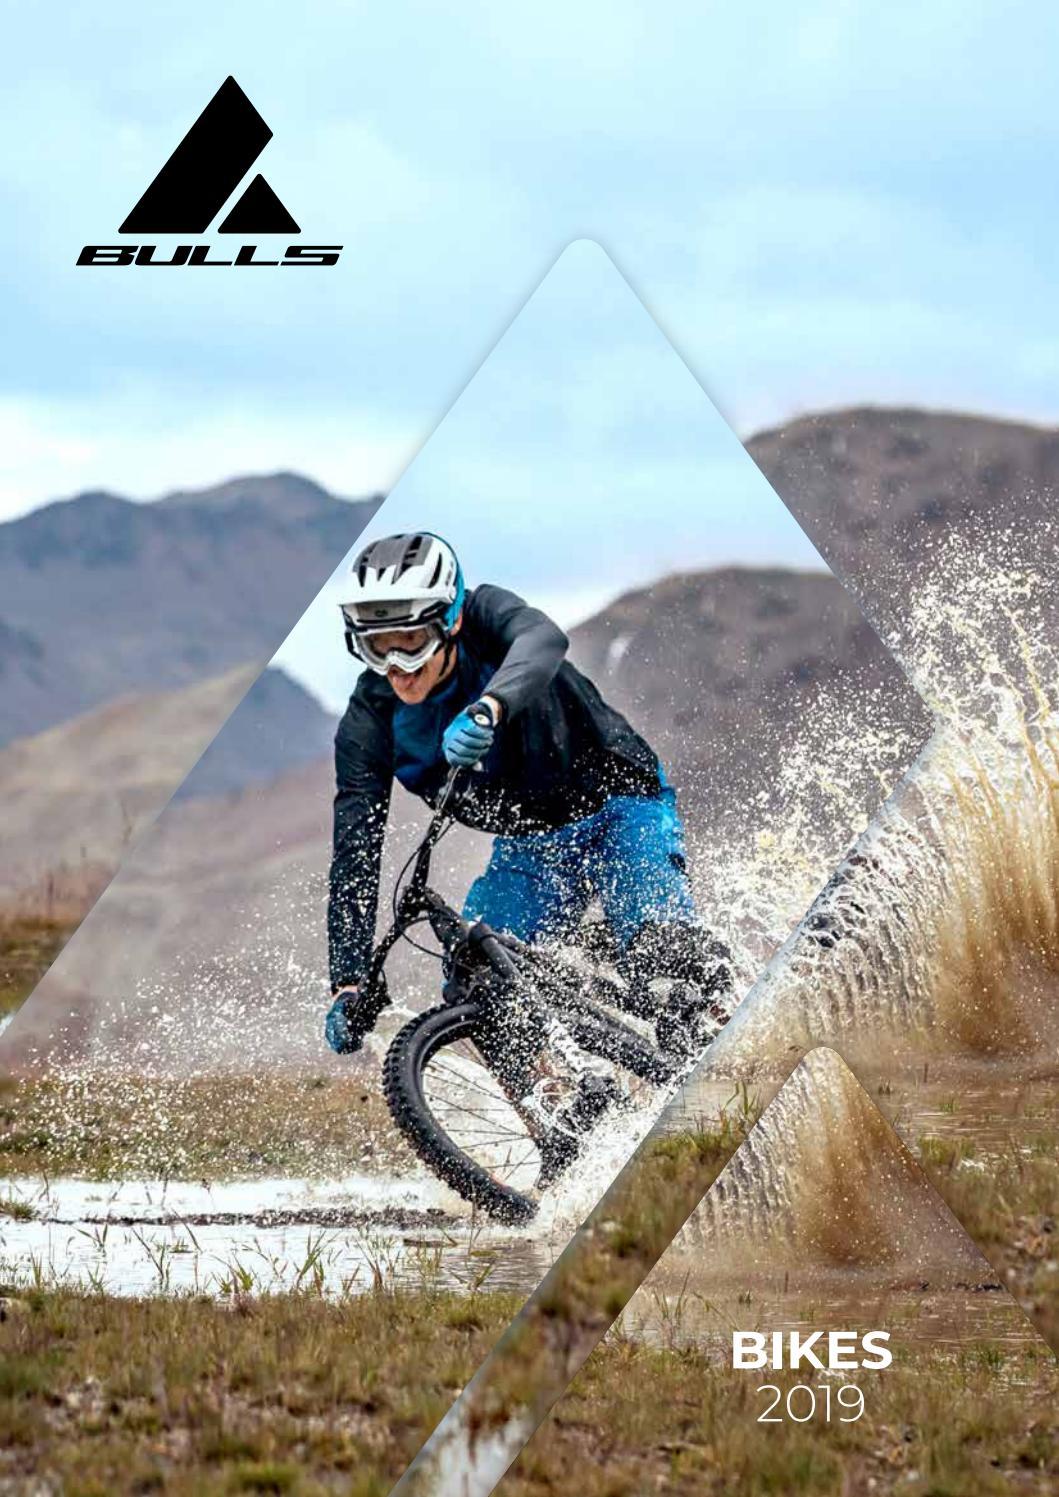 MTB XC Road Bike Pedal DU Bearing Nylon fiber Flat Pedals EVO 1 pair Black